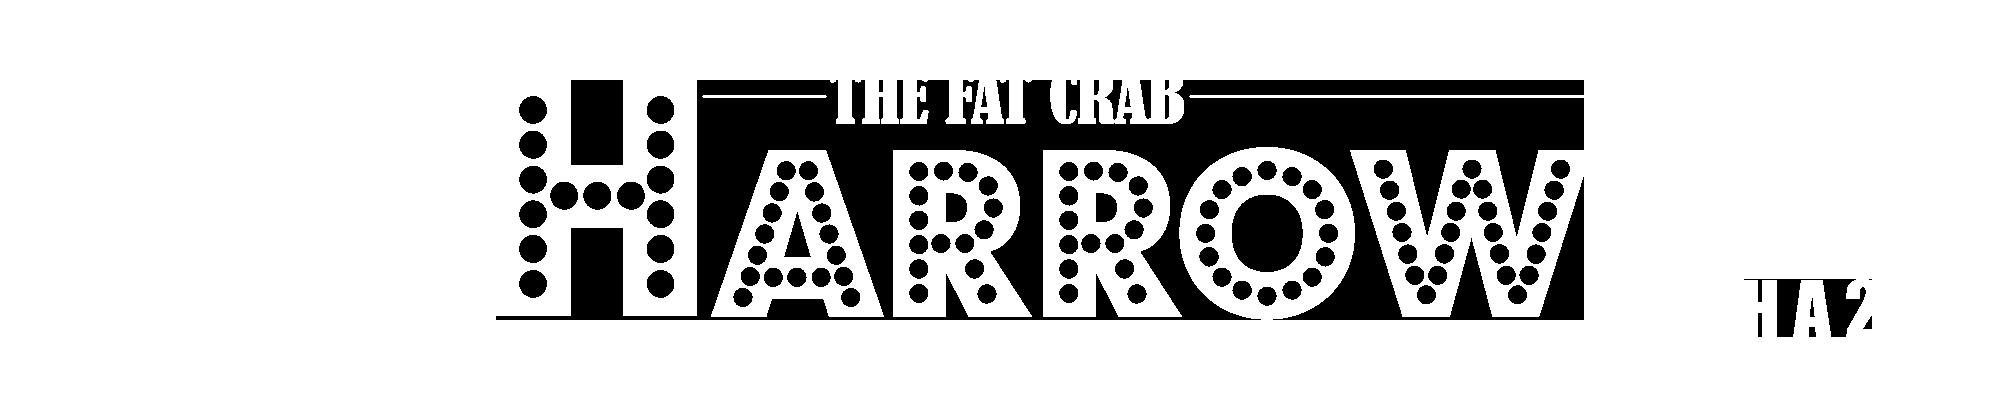 The Fat Crab Harrow